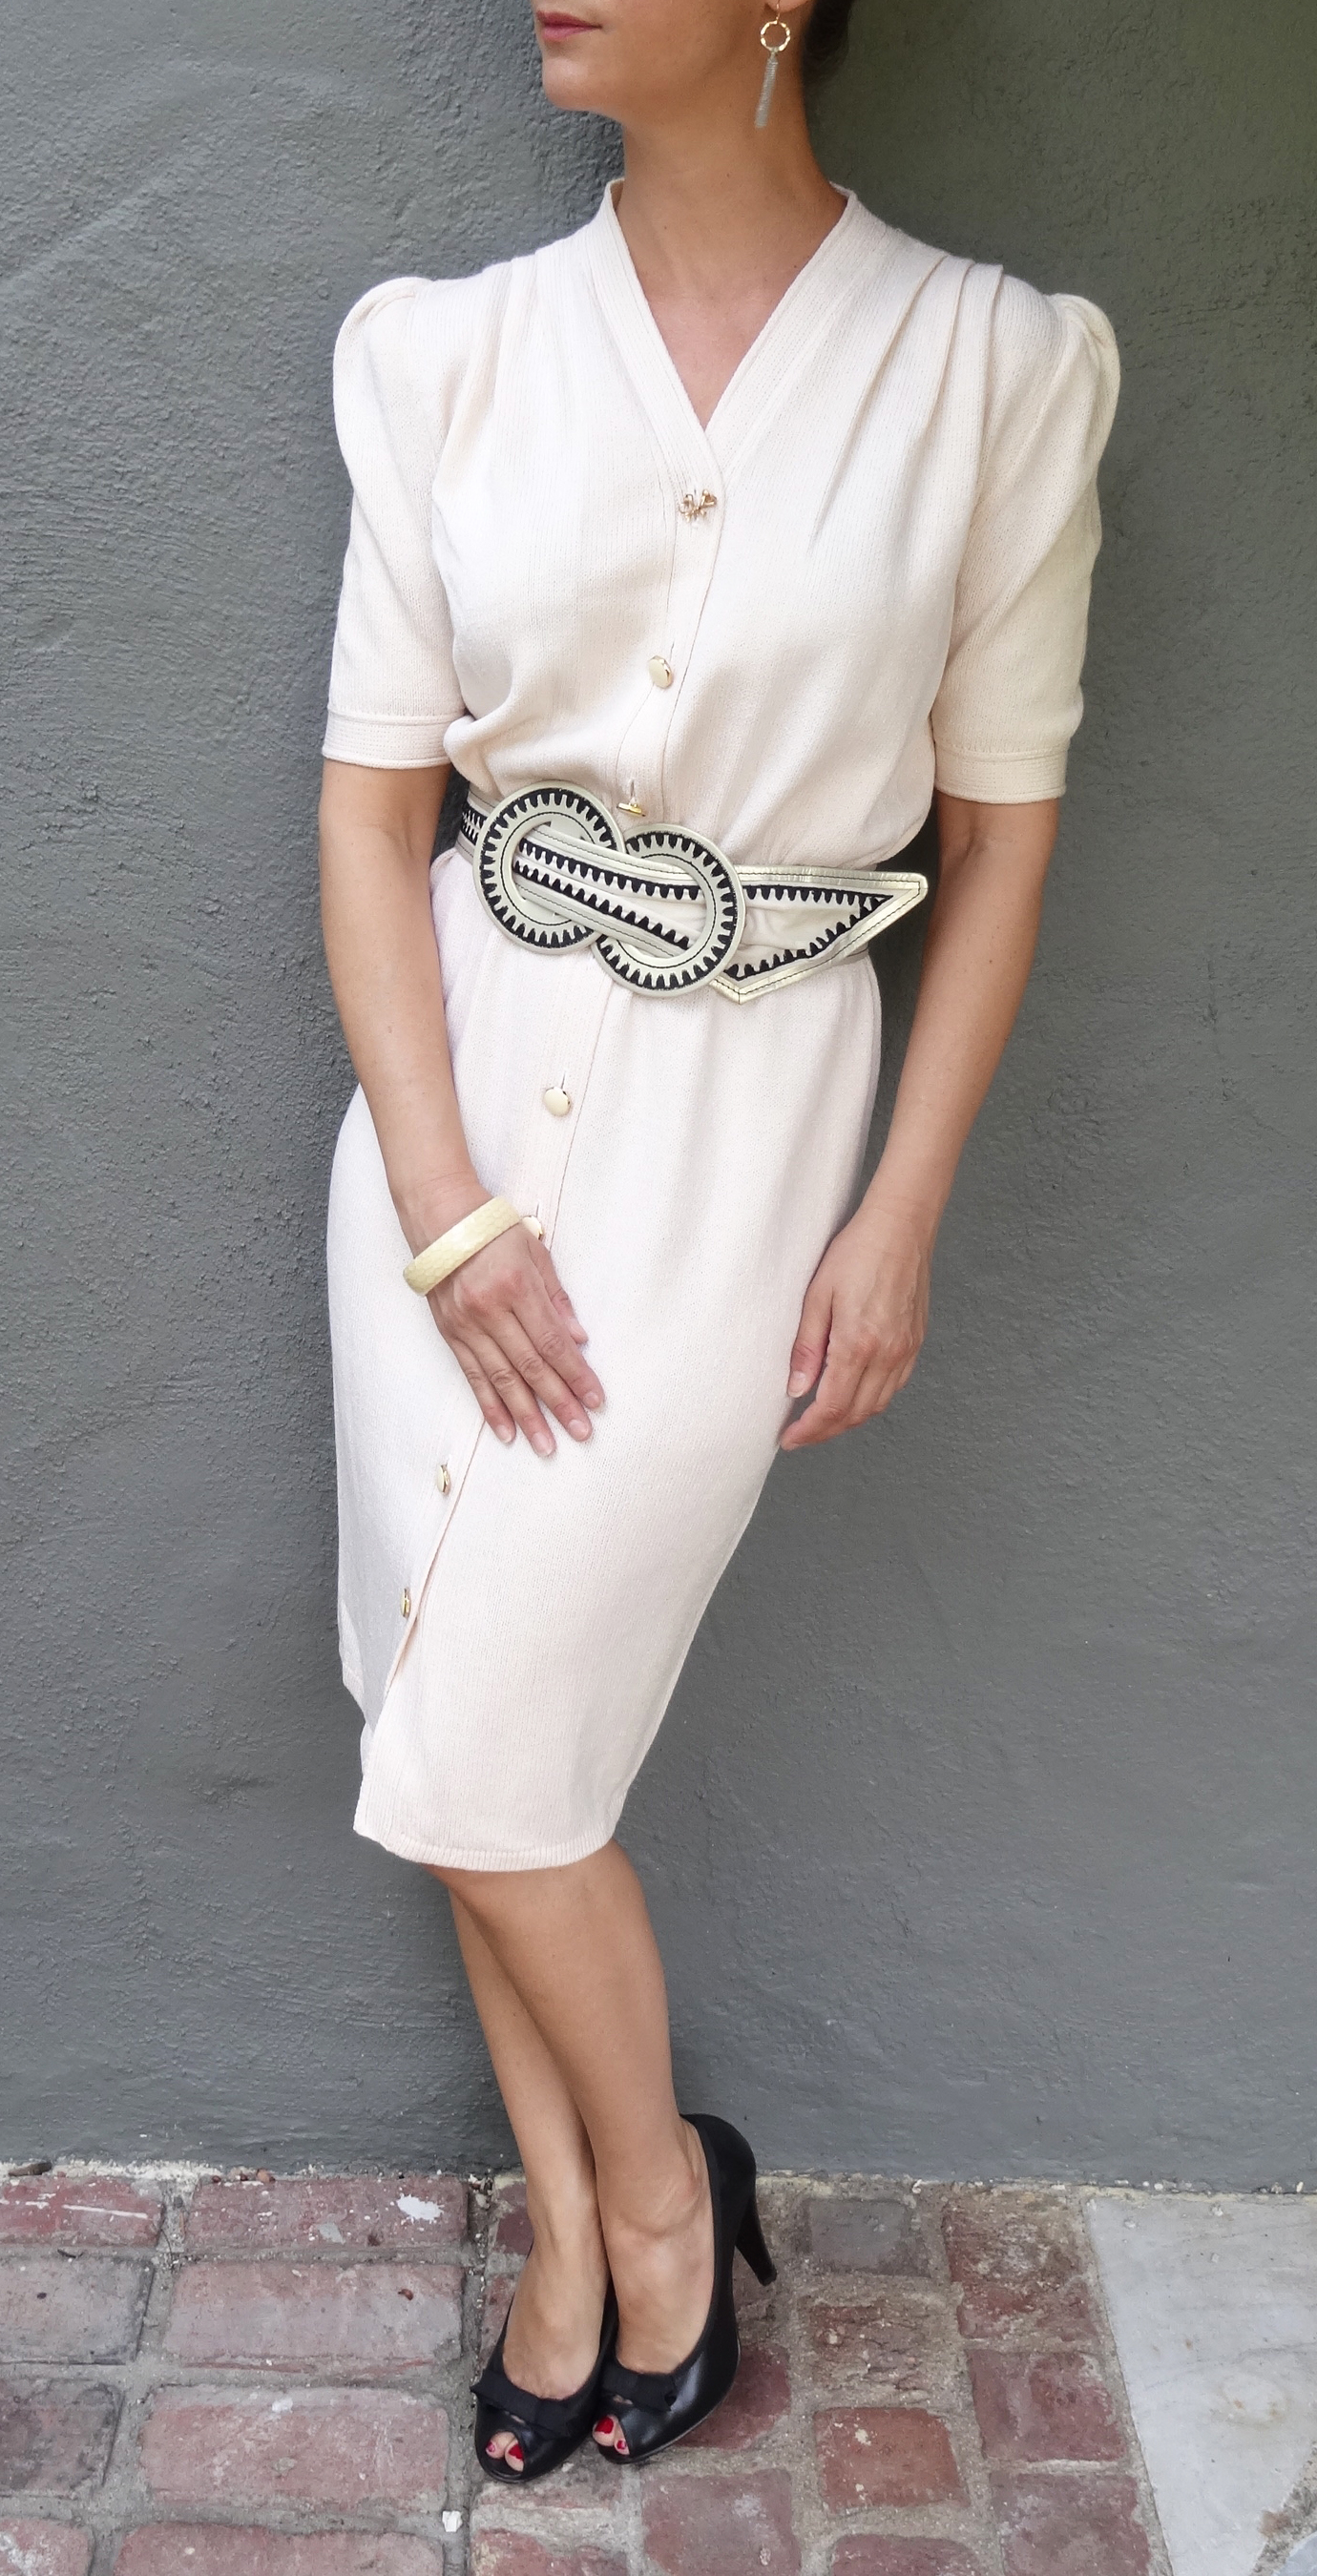 Vintage St. John dress, Marc Jacobs peep toes, Anthropolgie belt